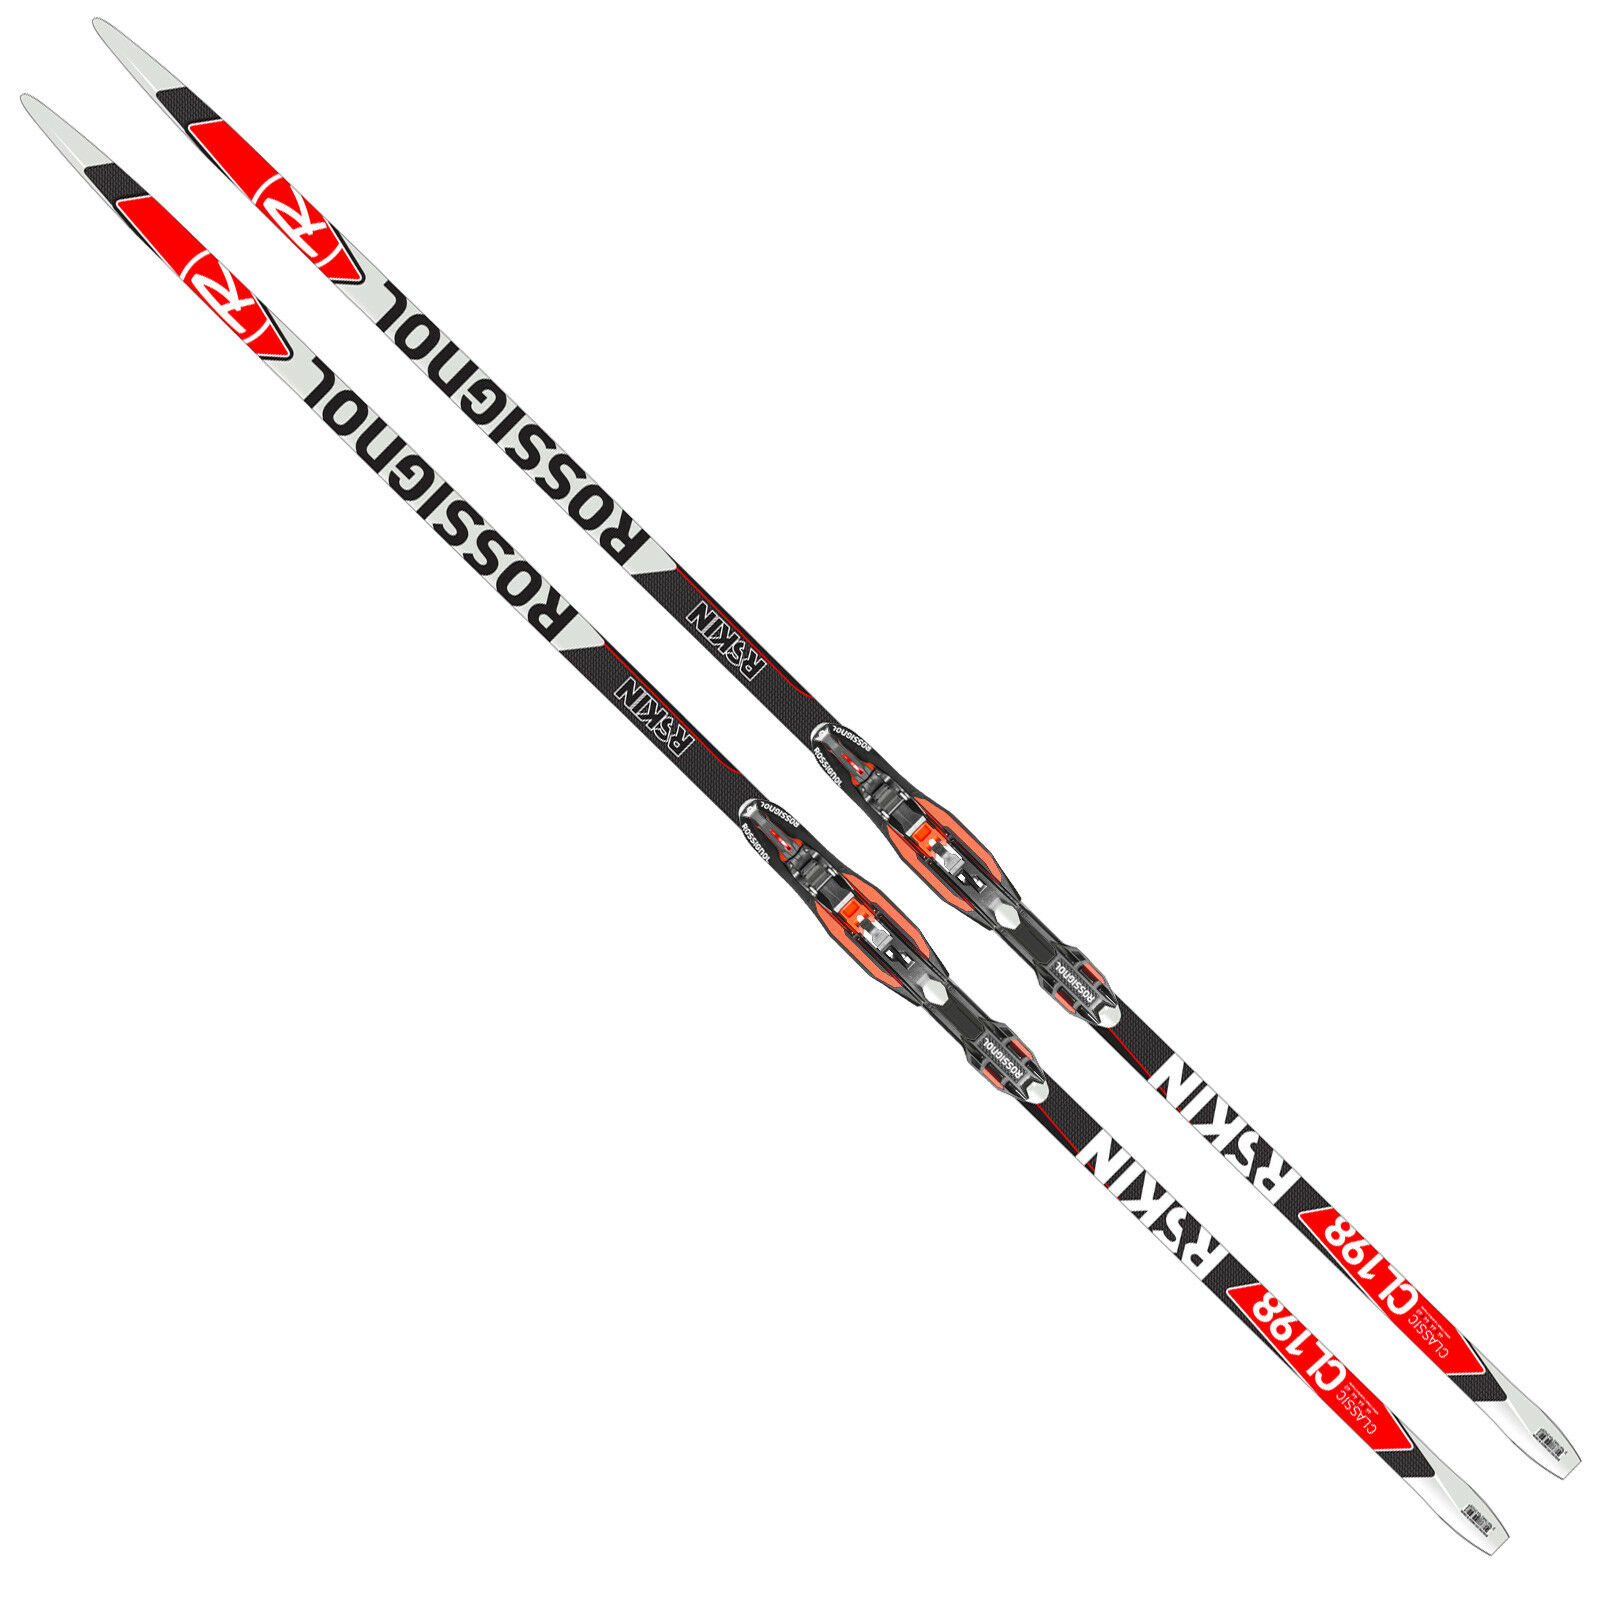 Rossignol R-Skin IFP Unisex-Langlaufski inklusive Race Classic Bindung Ski-Set